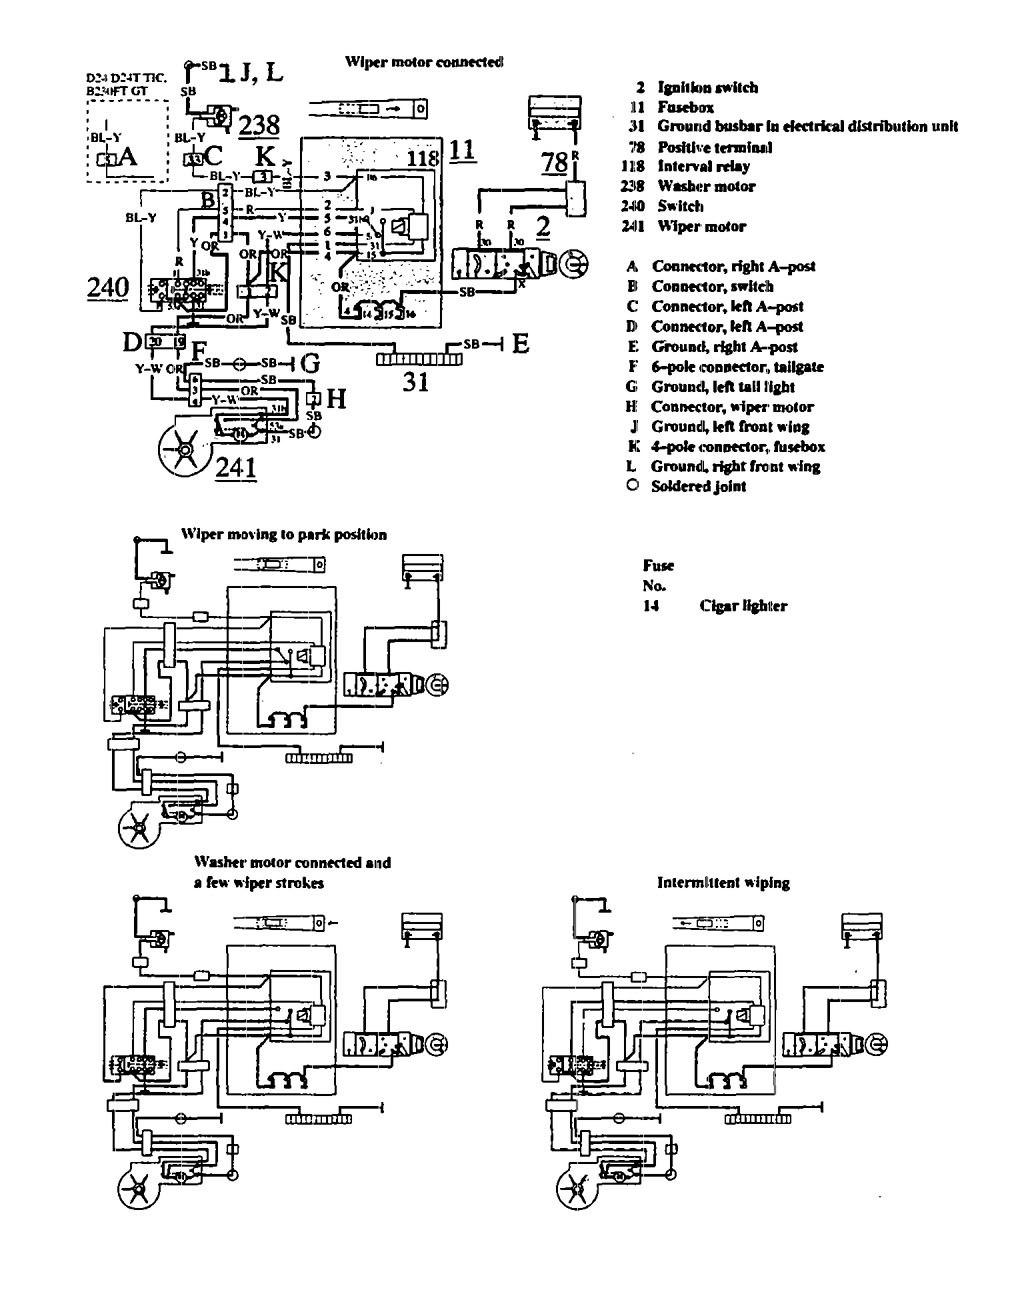 1991 volvo 940 stereo wiring diagram basic sentence diagramming worksheet diagrams wiper washer